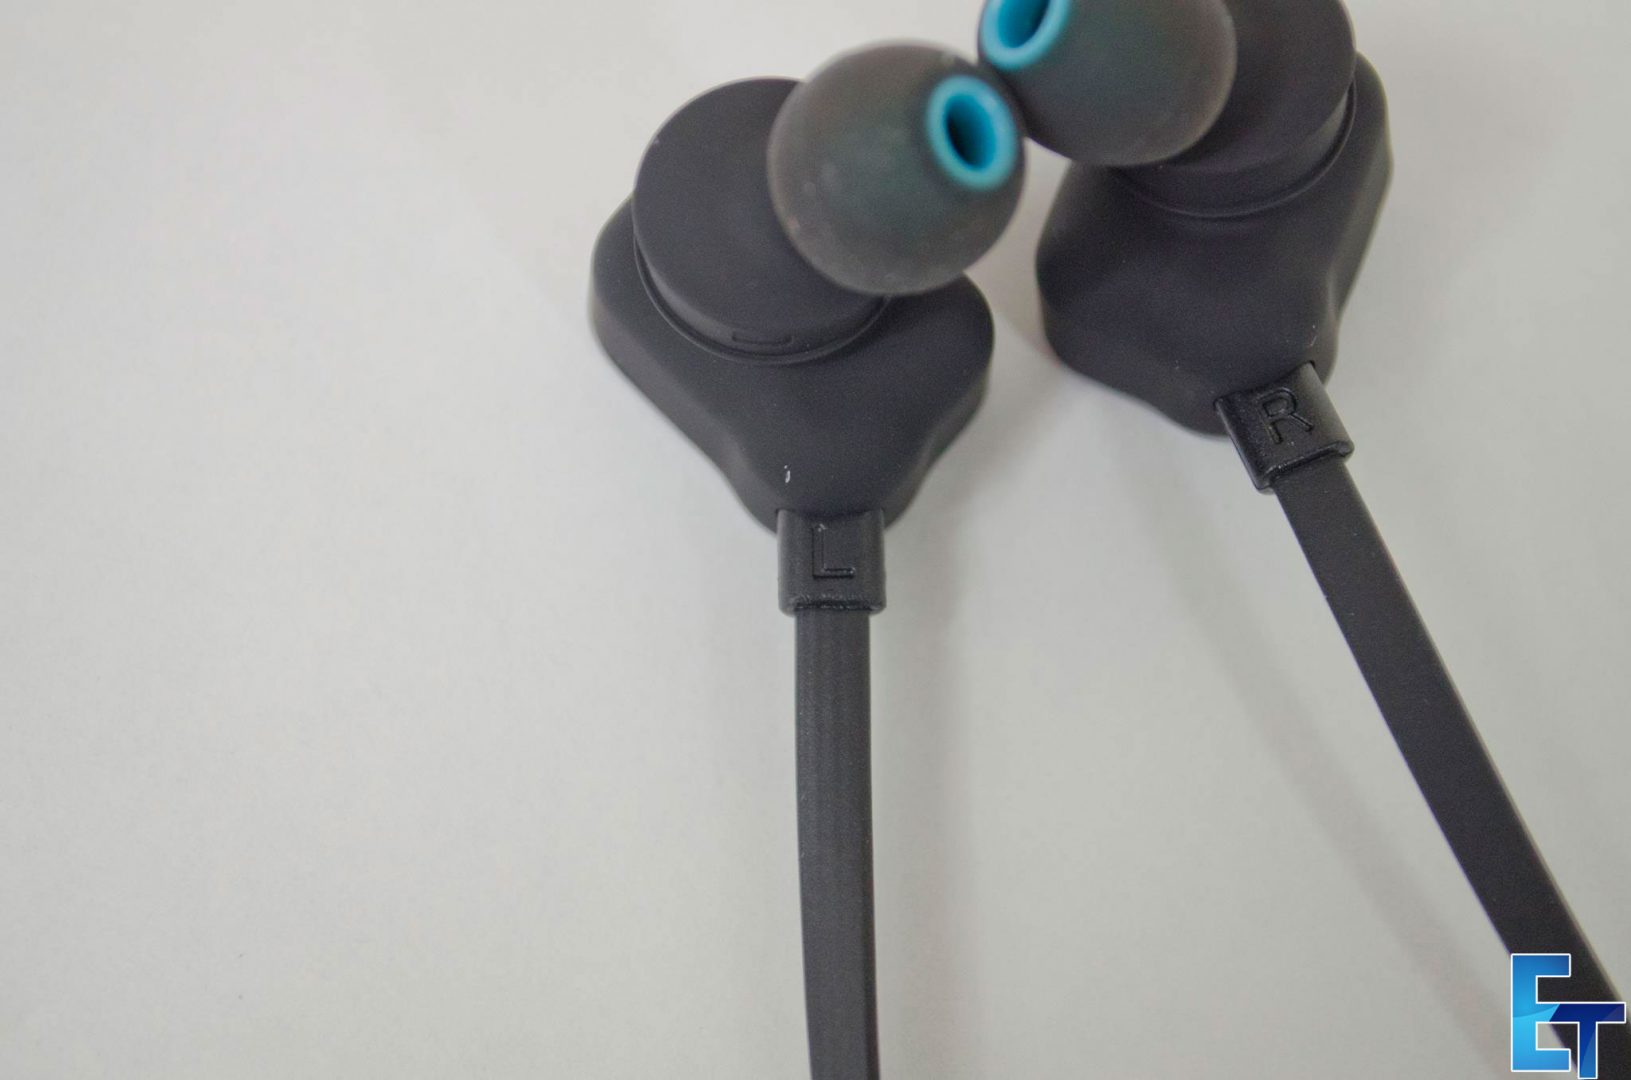 Mpow-Wolverine-Wireless-Bluetooth-4.1-Sport-Headphones_7